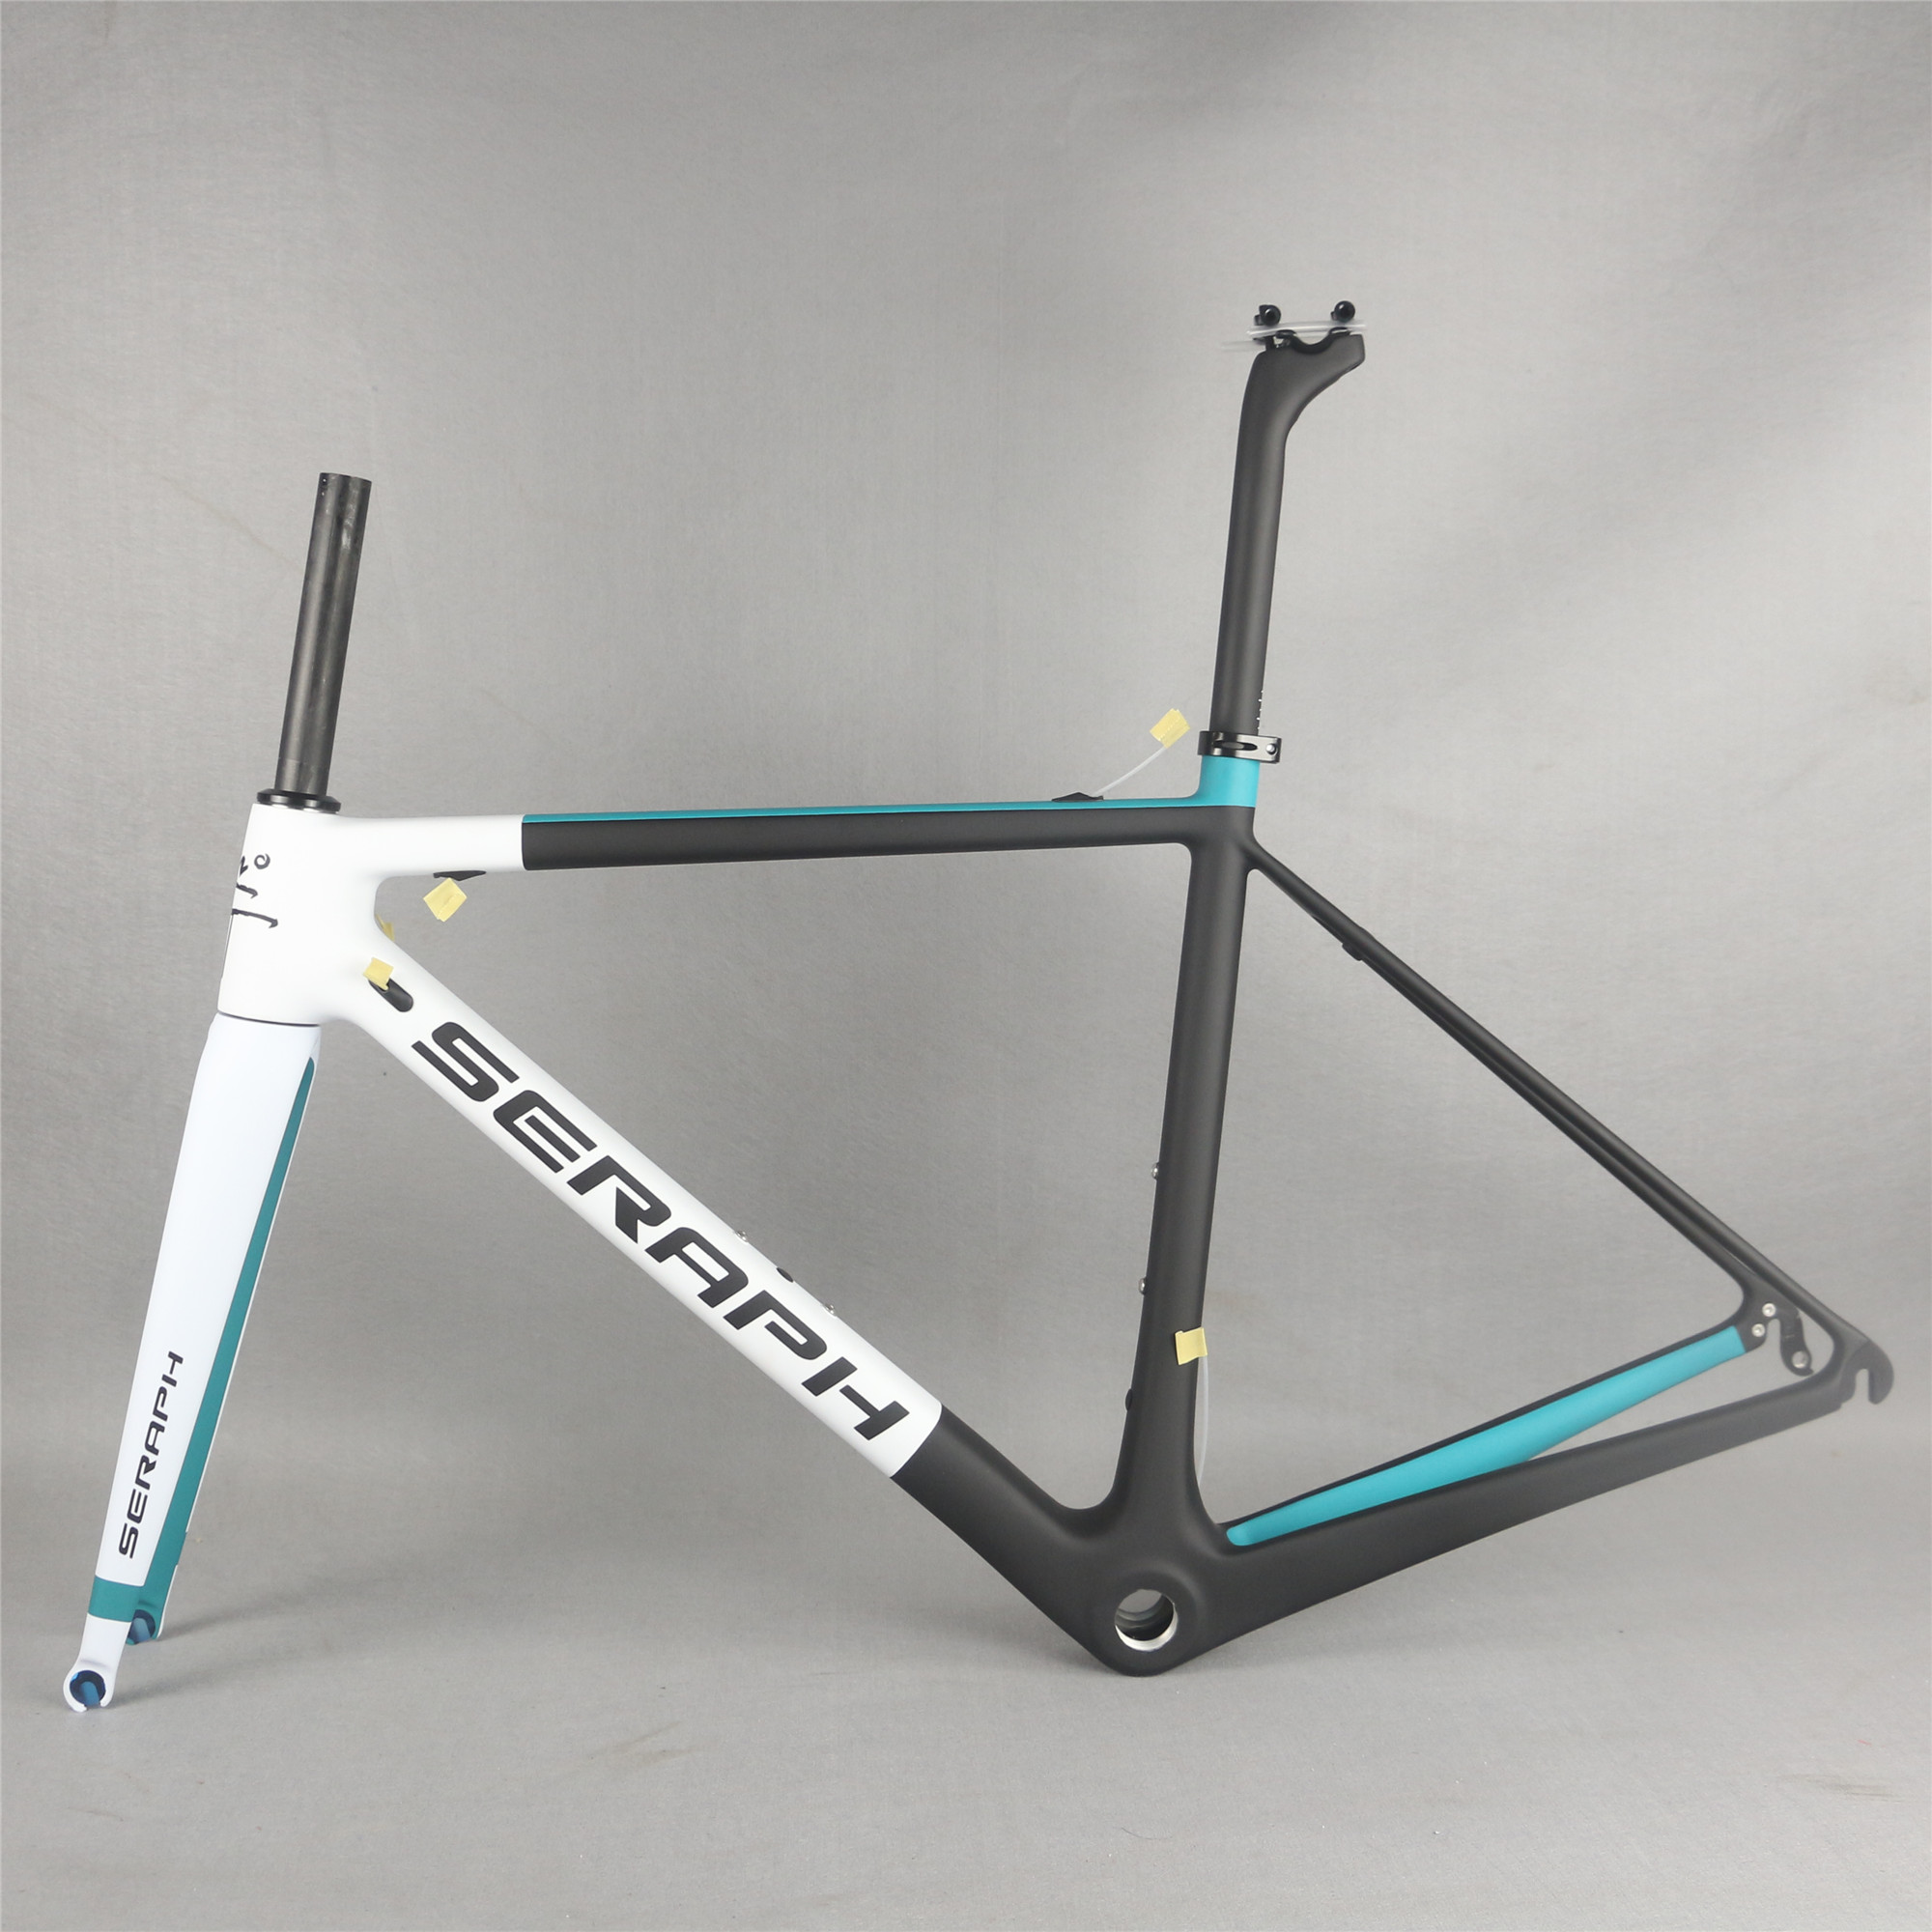 Seraph BSA Road Bike Frame BB30  Carbon Fiber T1000 Bicycle Frame FM066